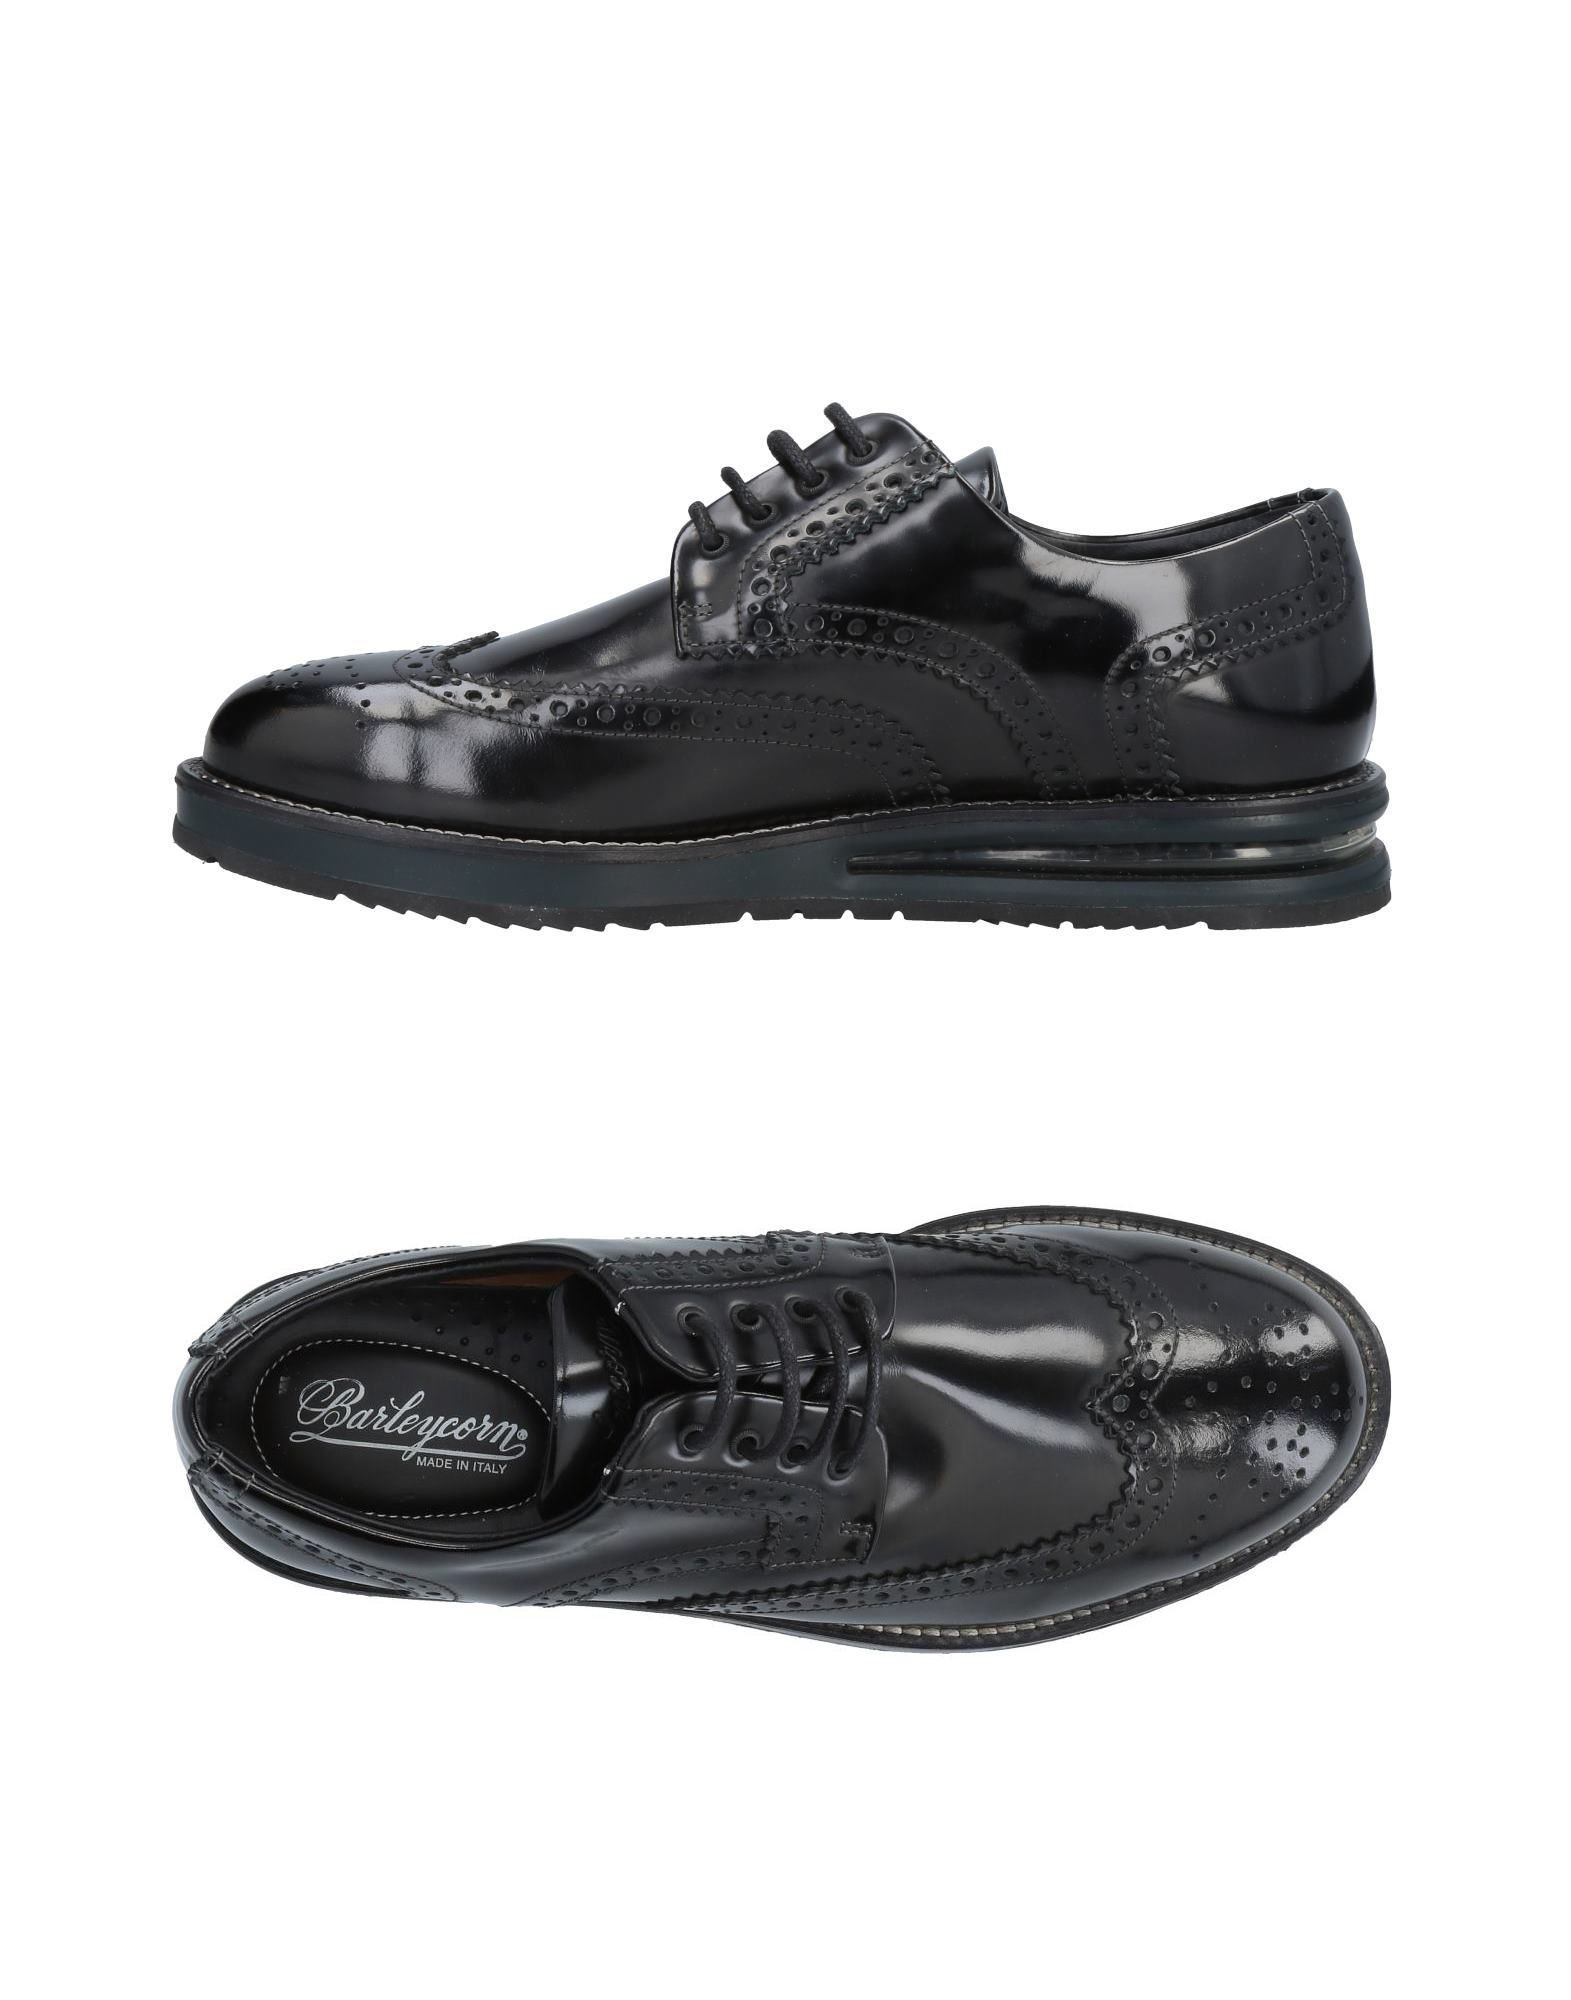 Barleycorn Schnürschuhe Herren beliebte  11253724UA Gute Qualität beliebte Herren Schuhe 054264